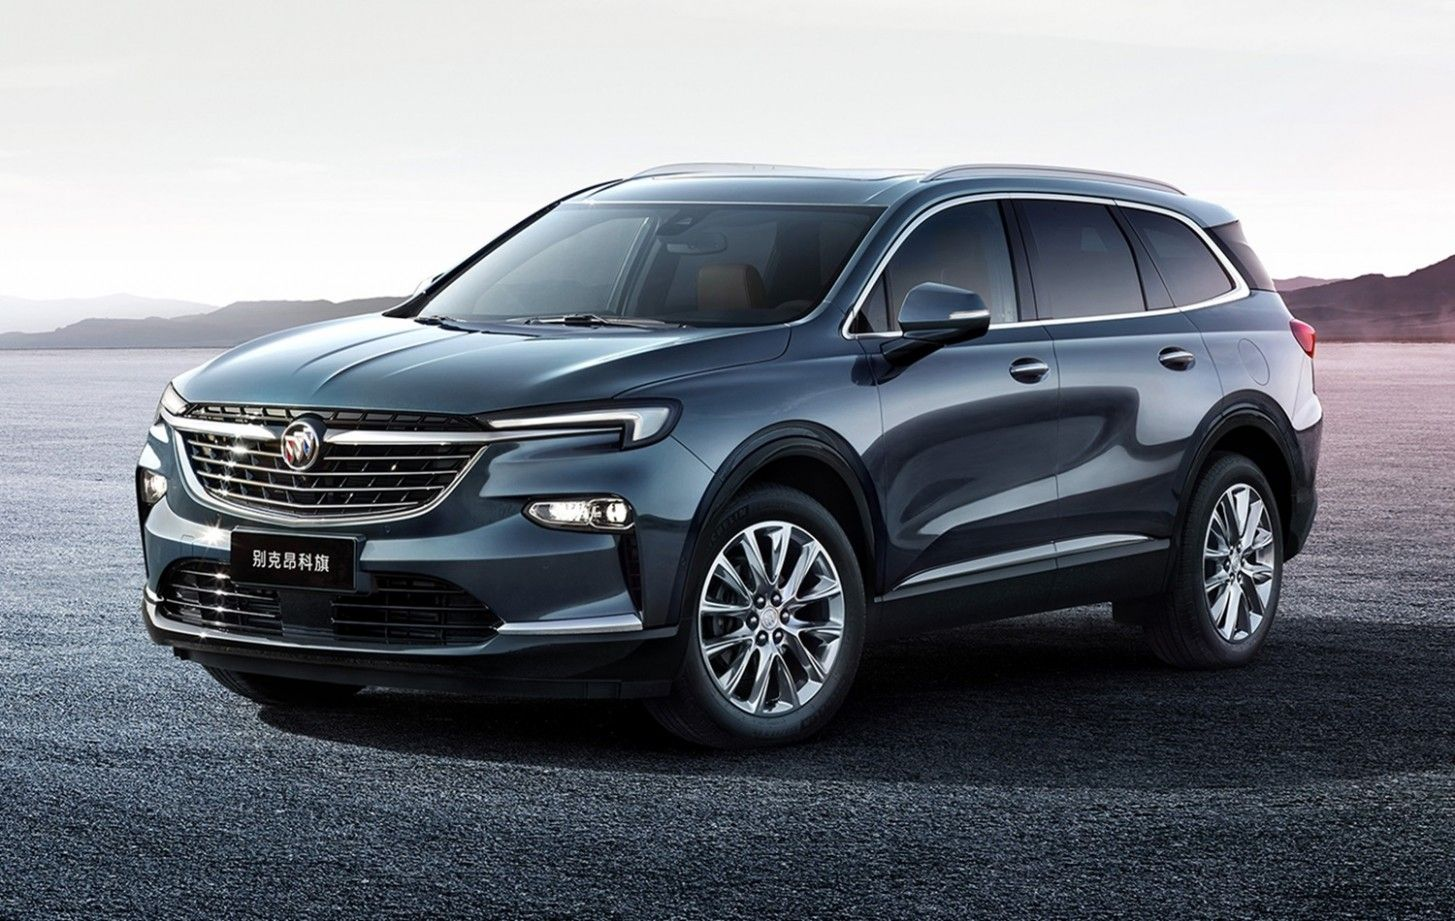 2021 Buick Lesabre Concept